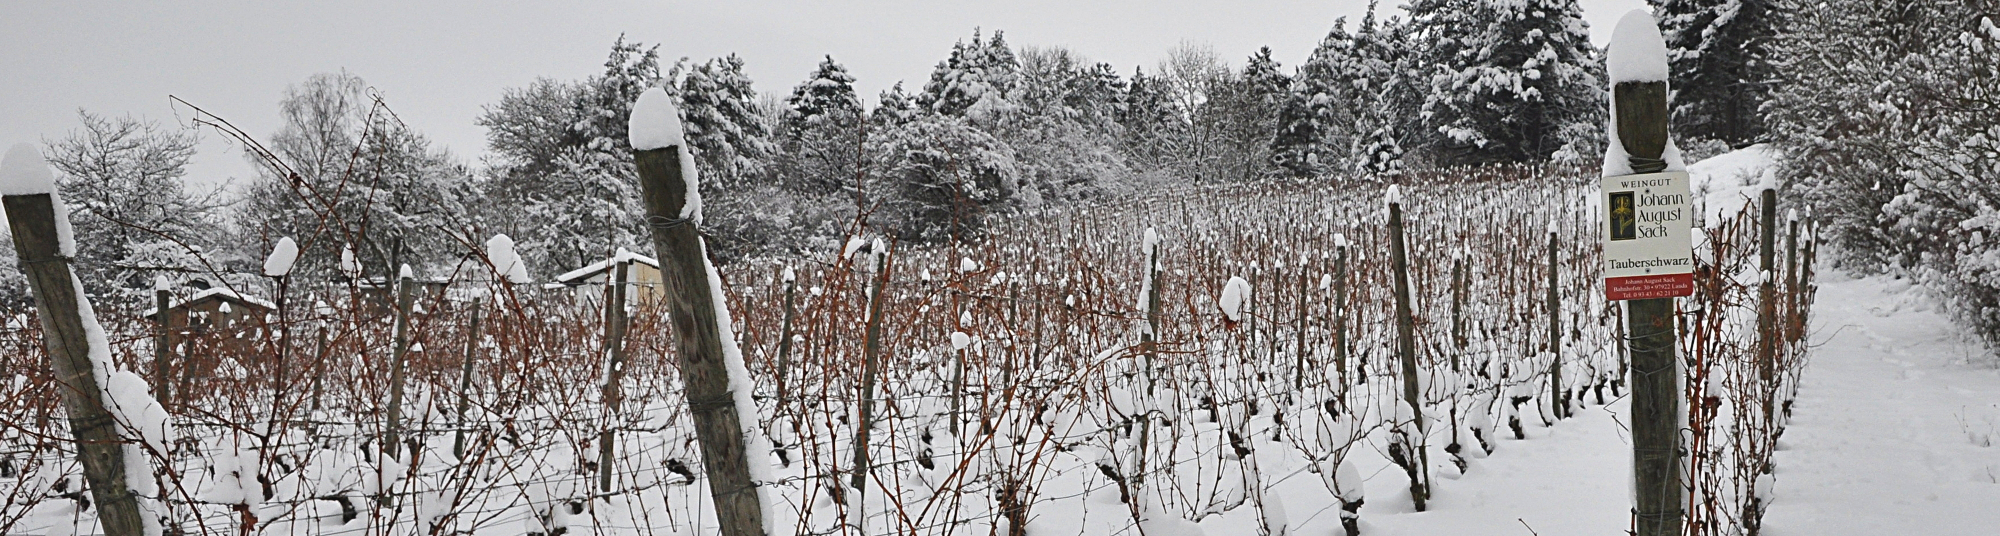 Weingut Johann August Sack - Winter 3